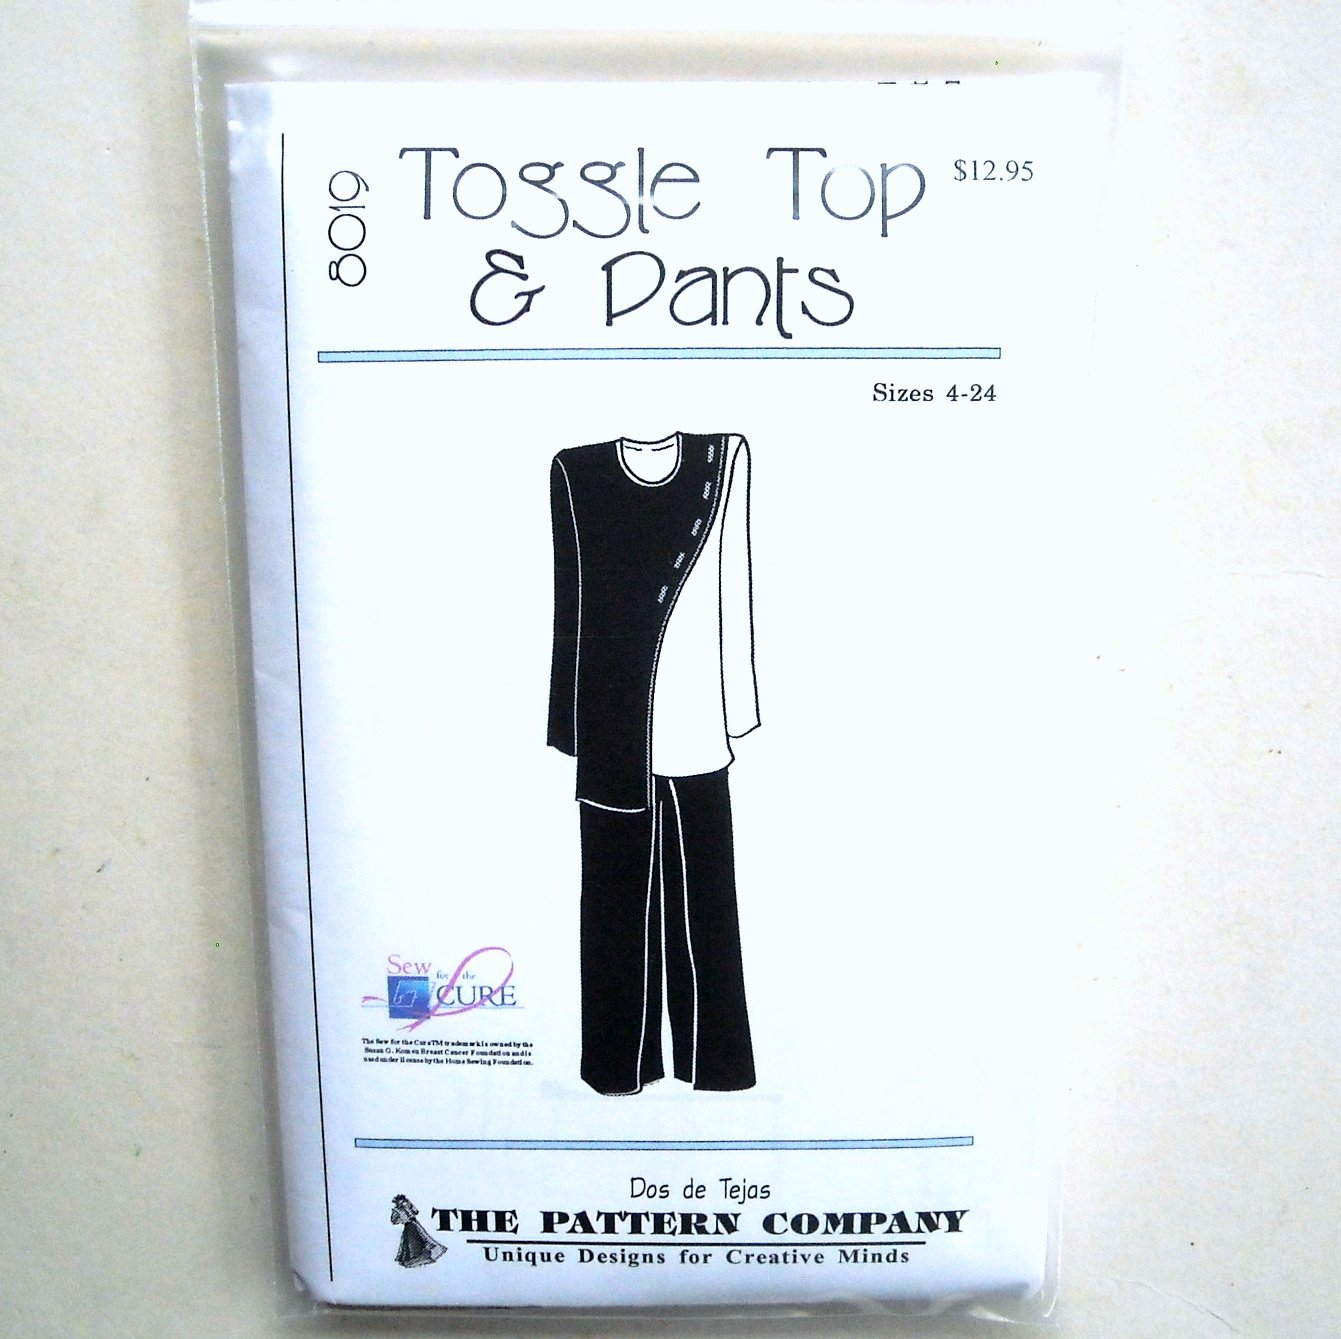 Misses Toggle Top Pants Dos De Tejas Sewing Pattern 8019